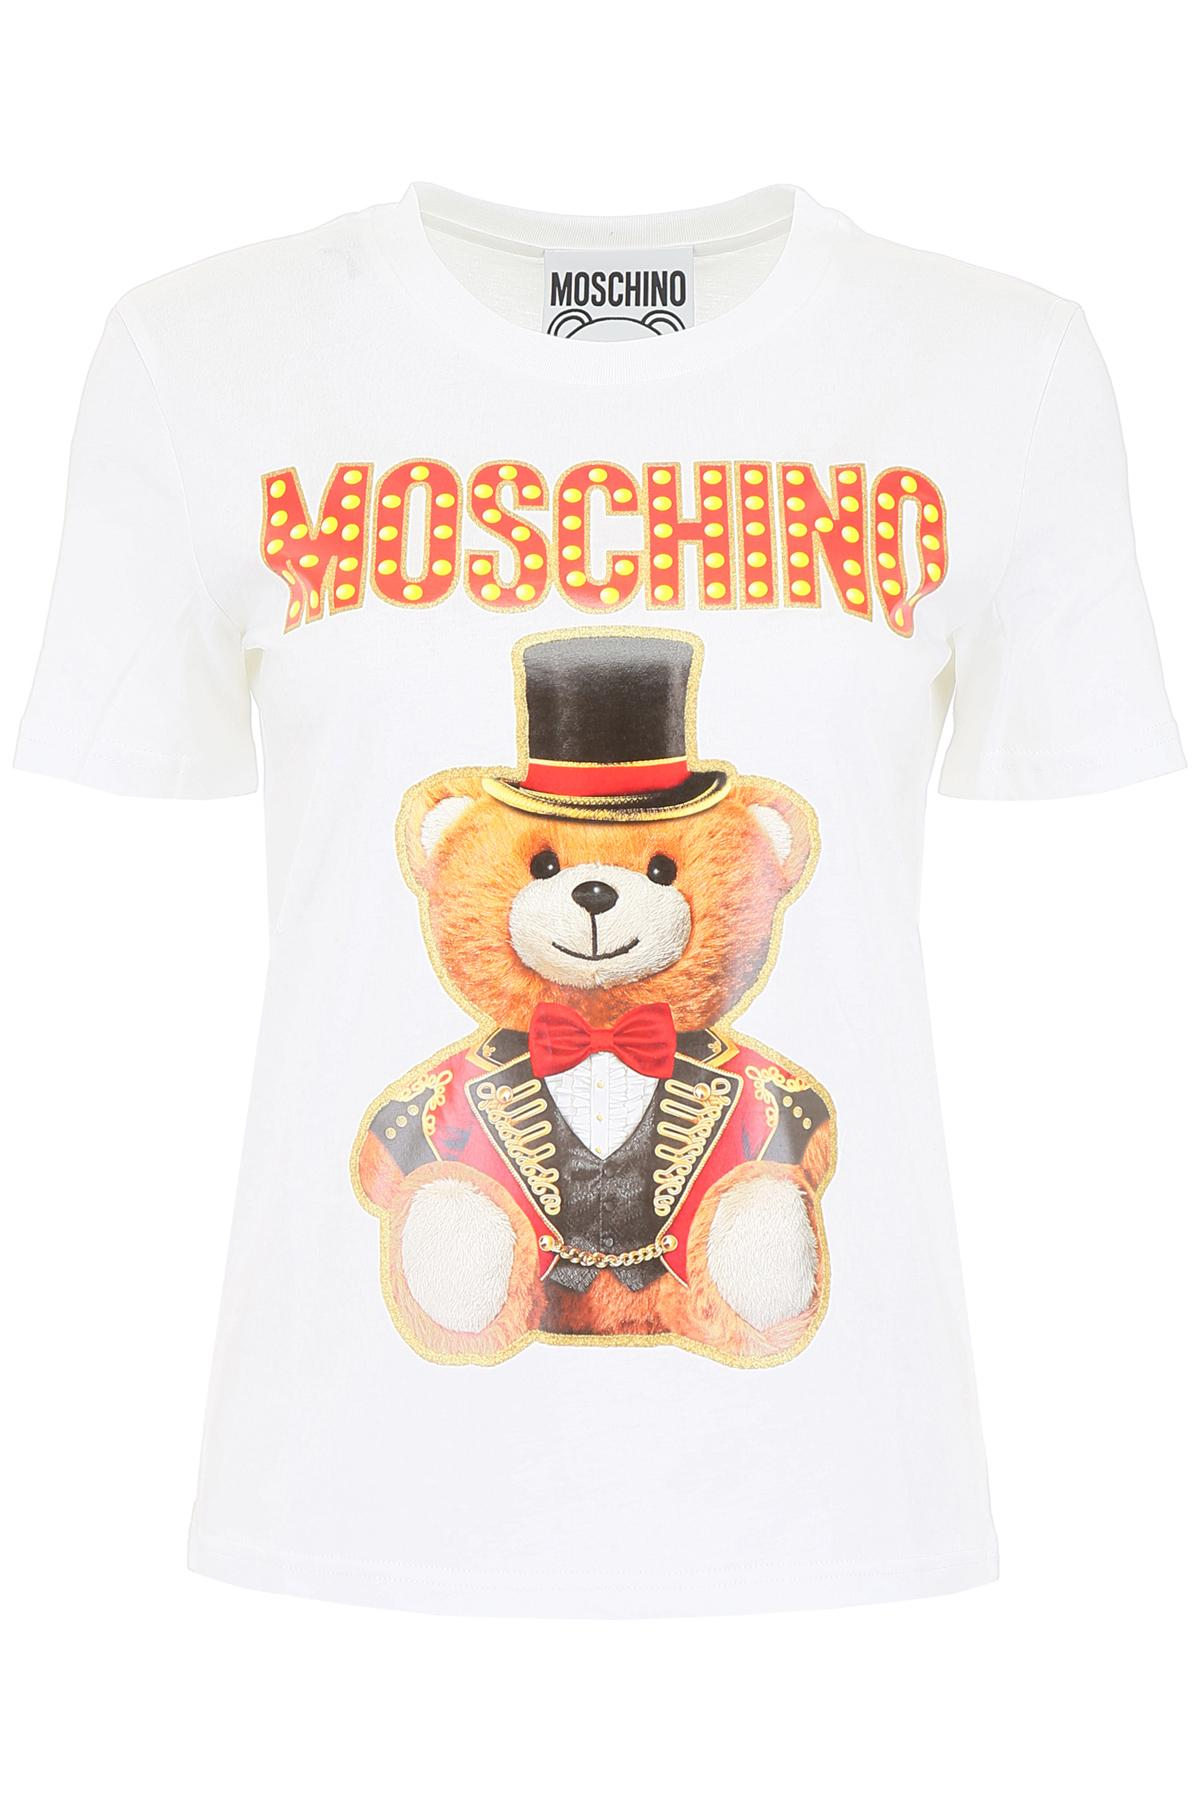 9e637ed8 Moschino - White Circus T-shirt - Lyst. View fullscreen